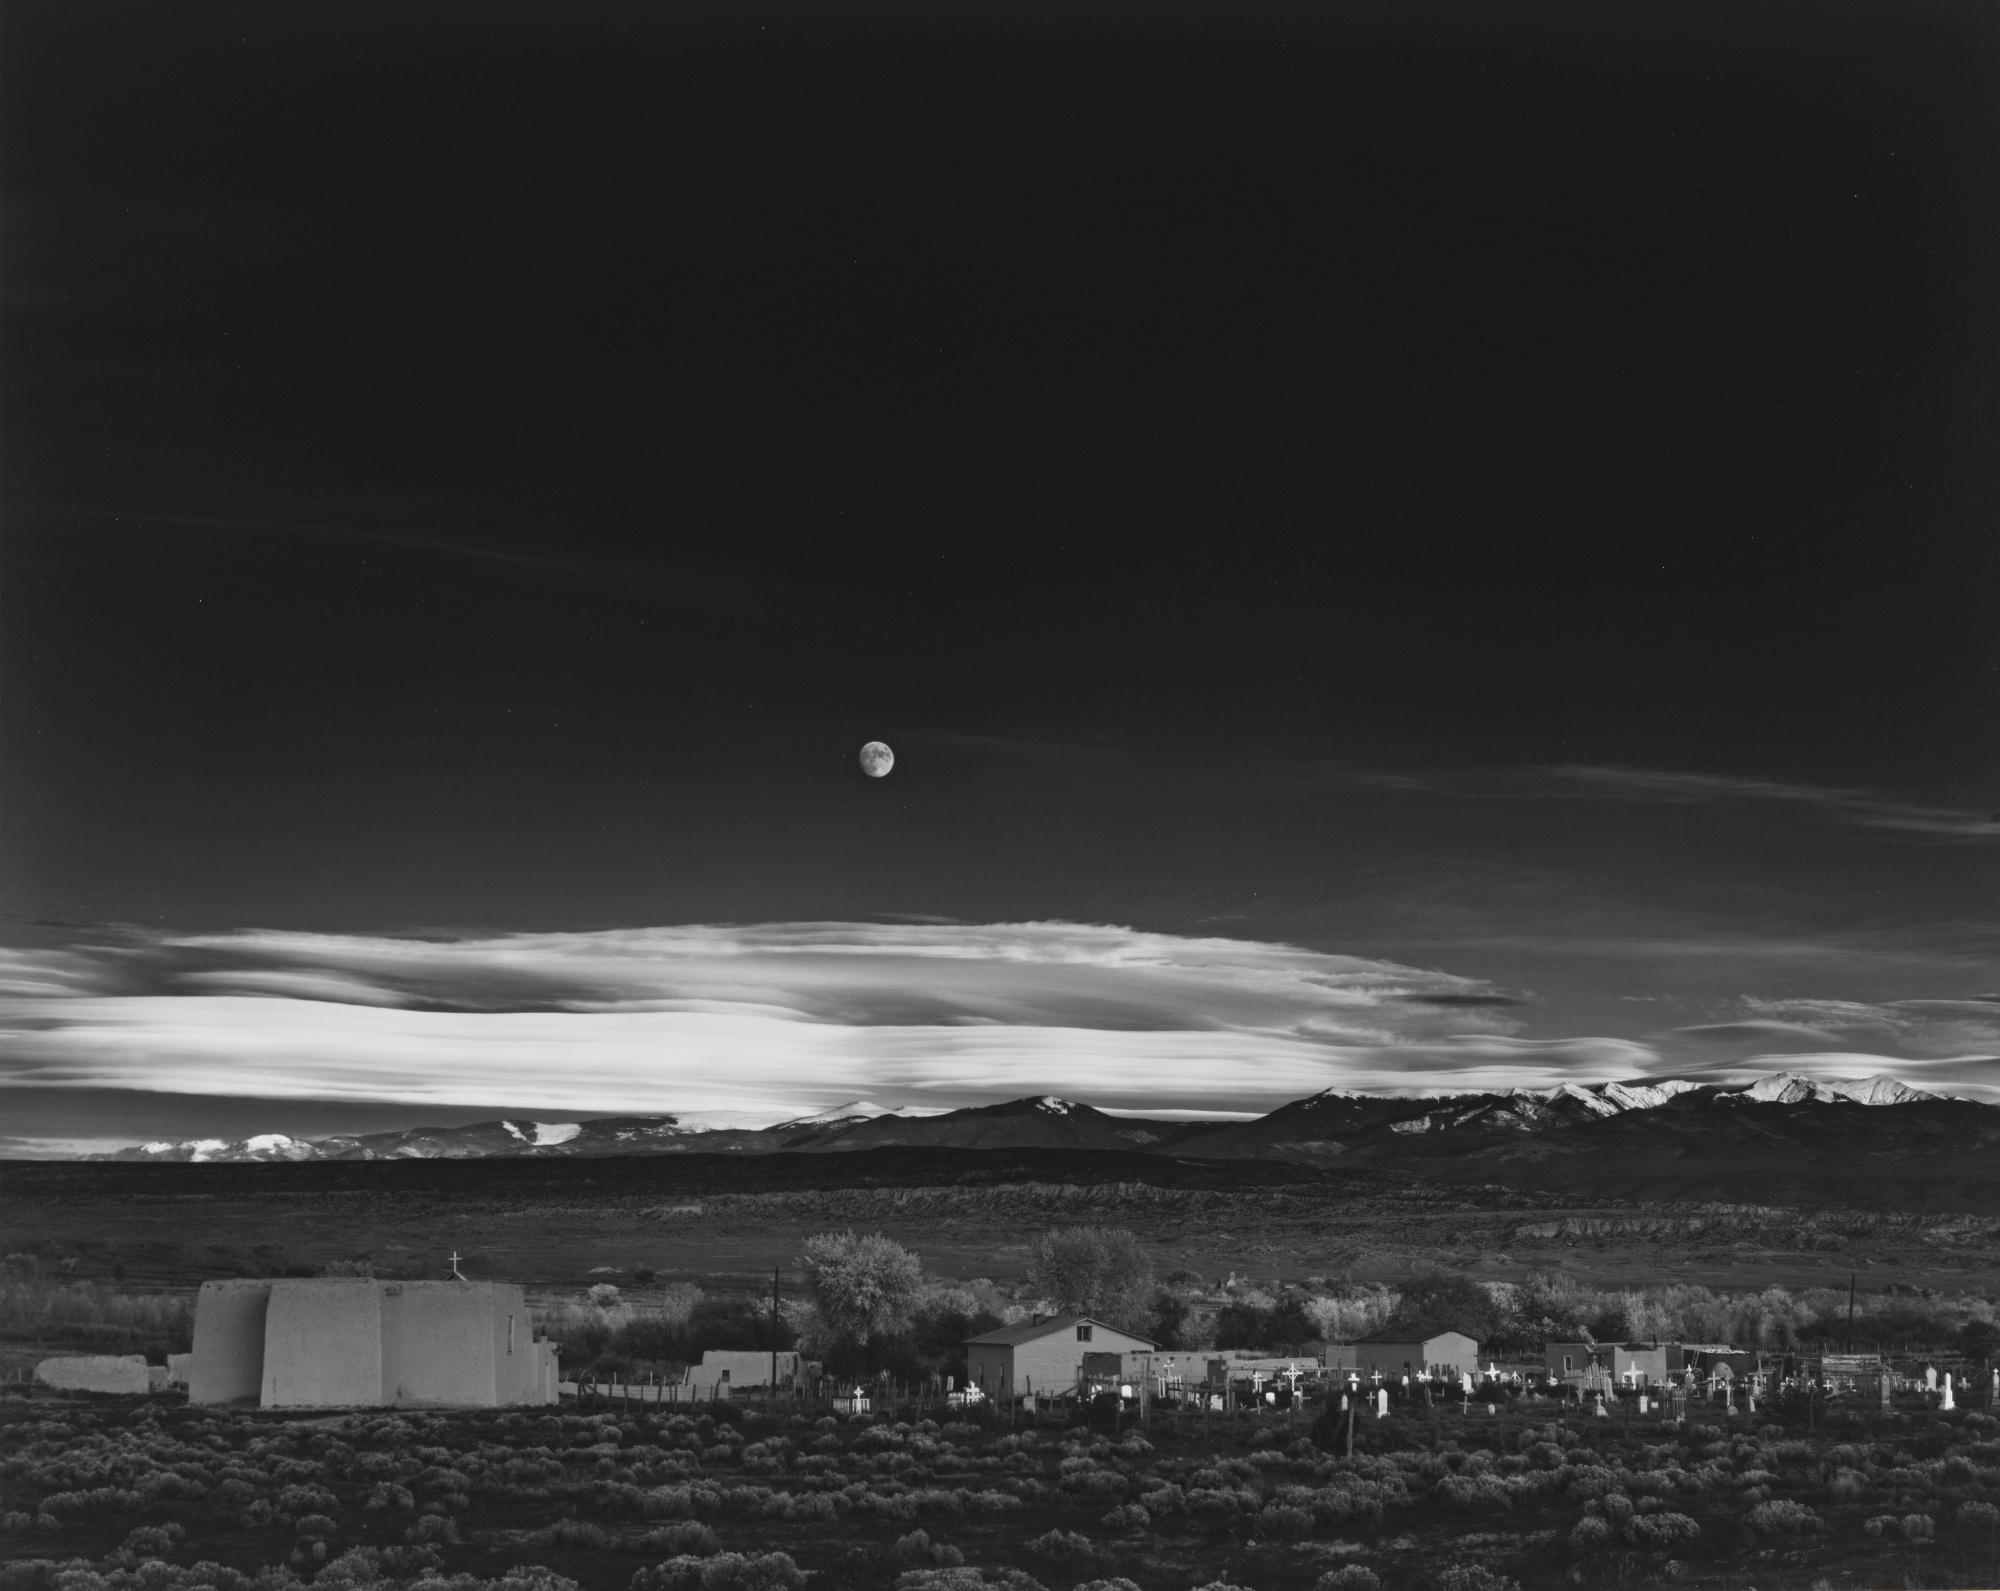 Ansel Adams-Moonrise HernandezNew Mexico-1941